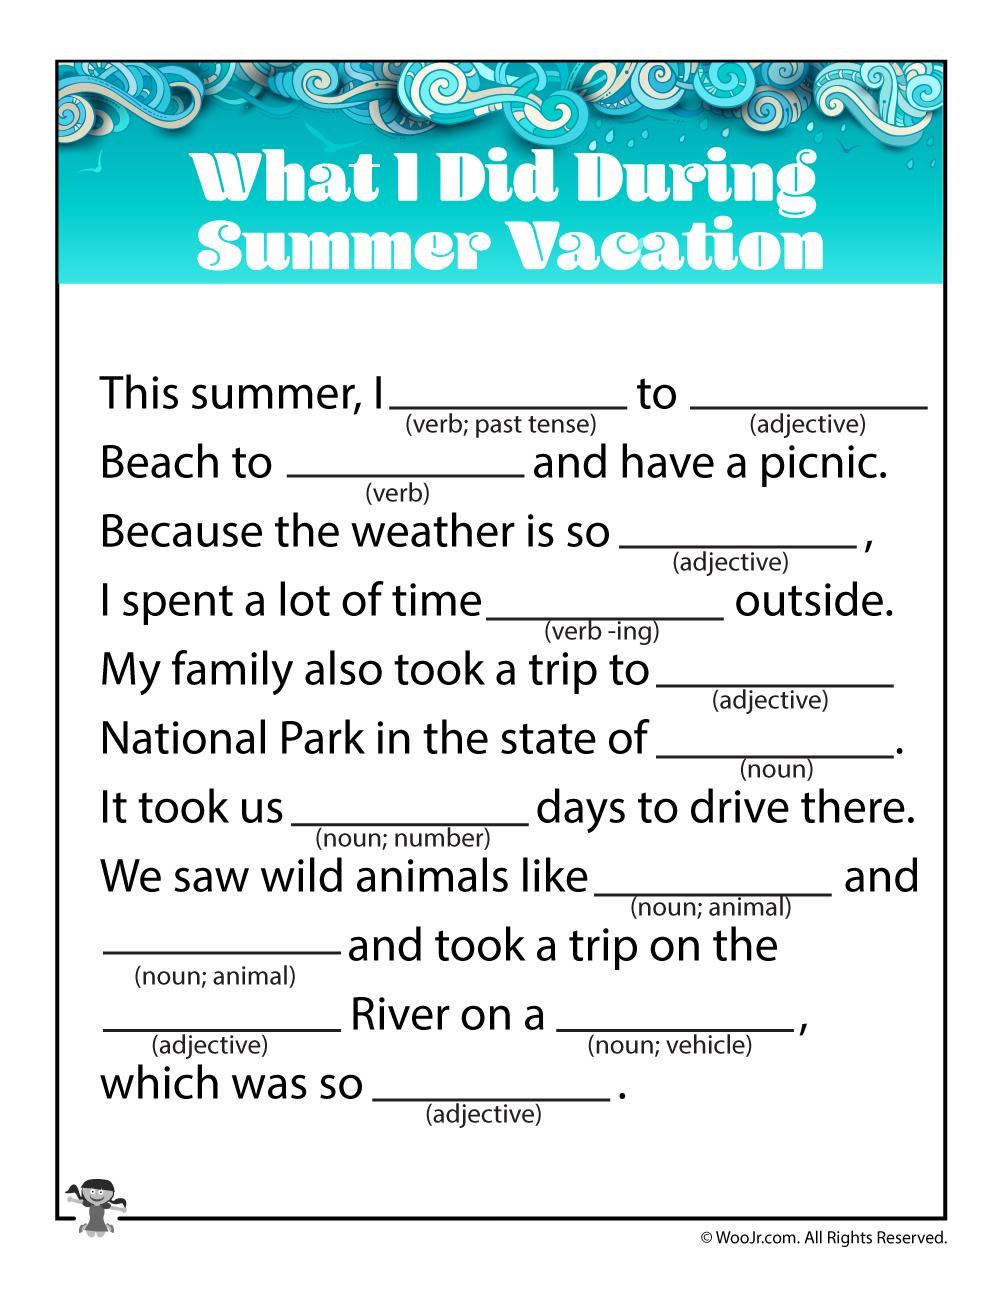 photo regarding Summer Mad Libs Printable identified as Summer season Getaway Nuts Libs Leancy Push